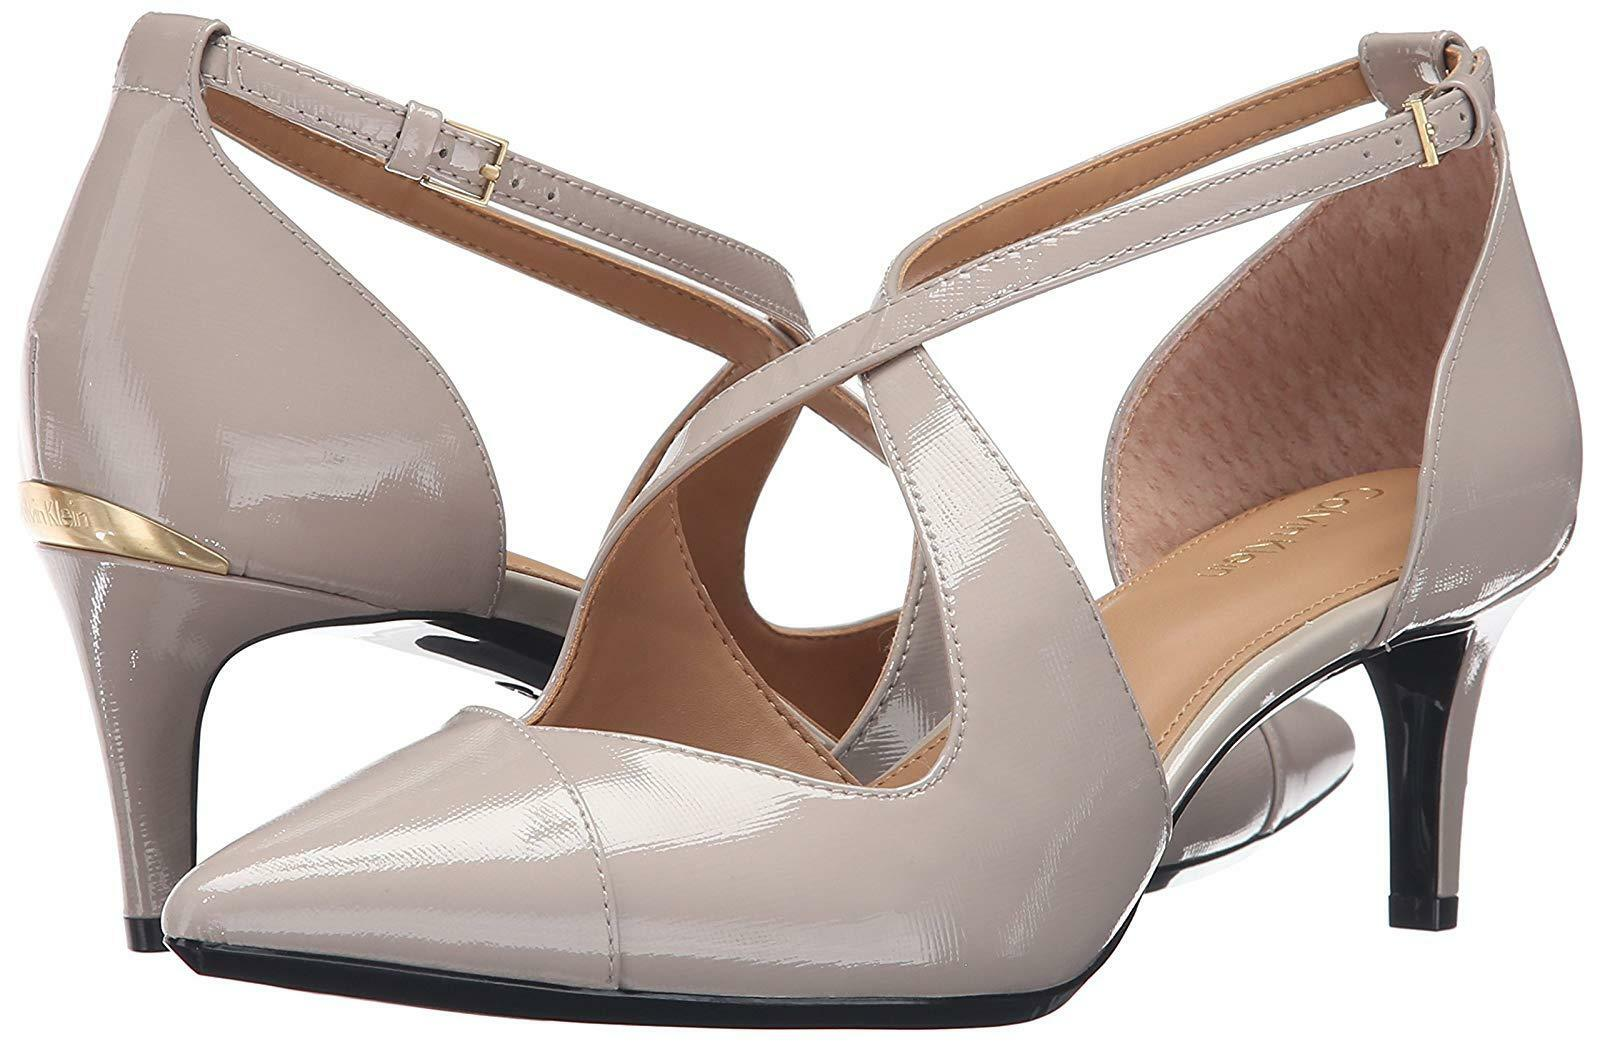 6M NEU Calvin Klein Pamette Mini Saffiano Clay Strappy Leder Damens Schuhes